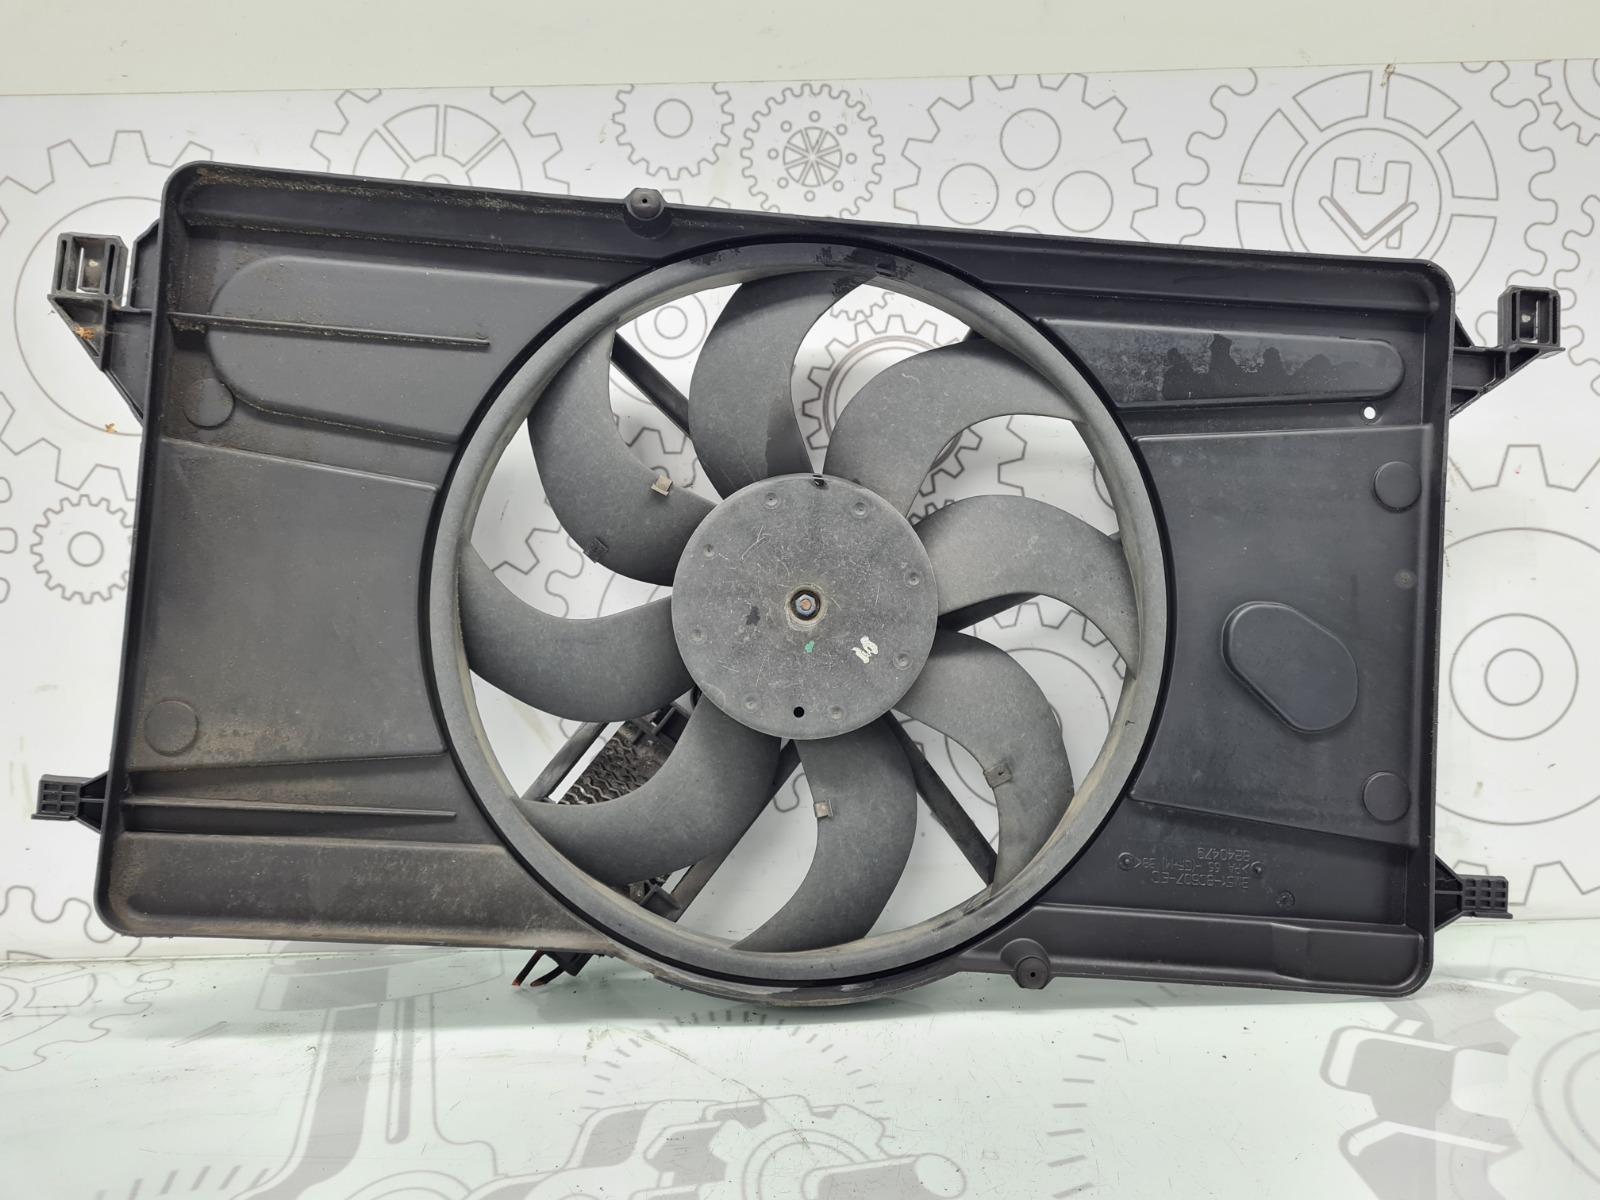 Вентилятор радиатора Ford Focus 1.6 I 2005 (б/у)